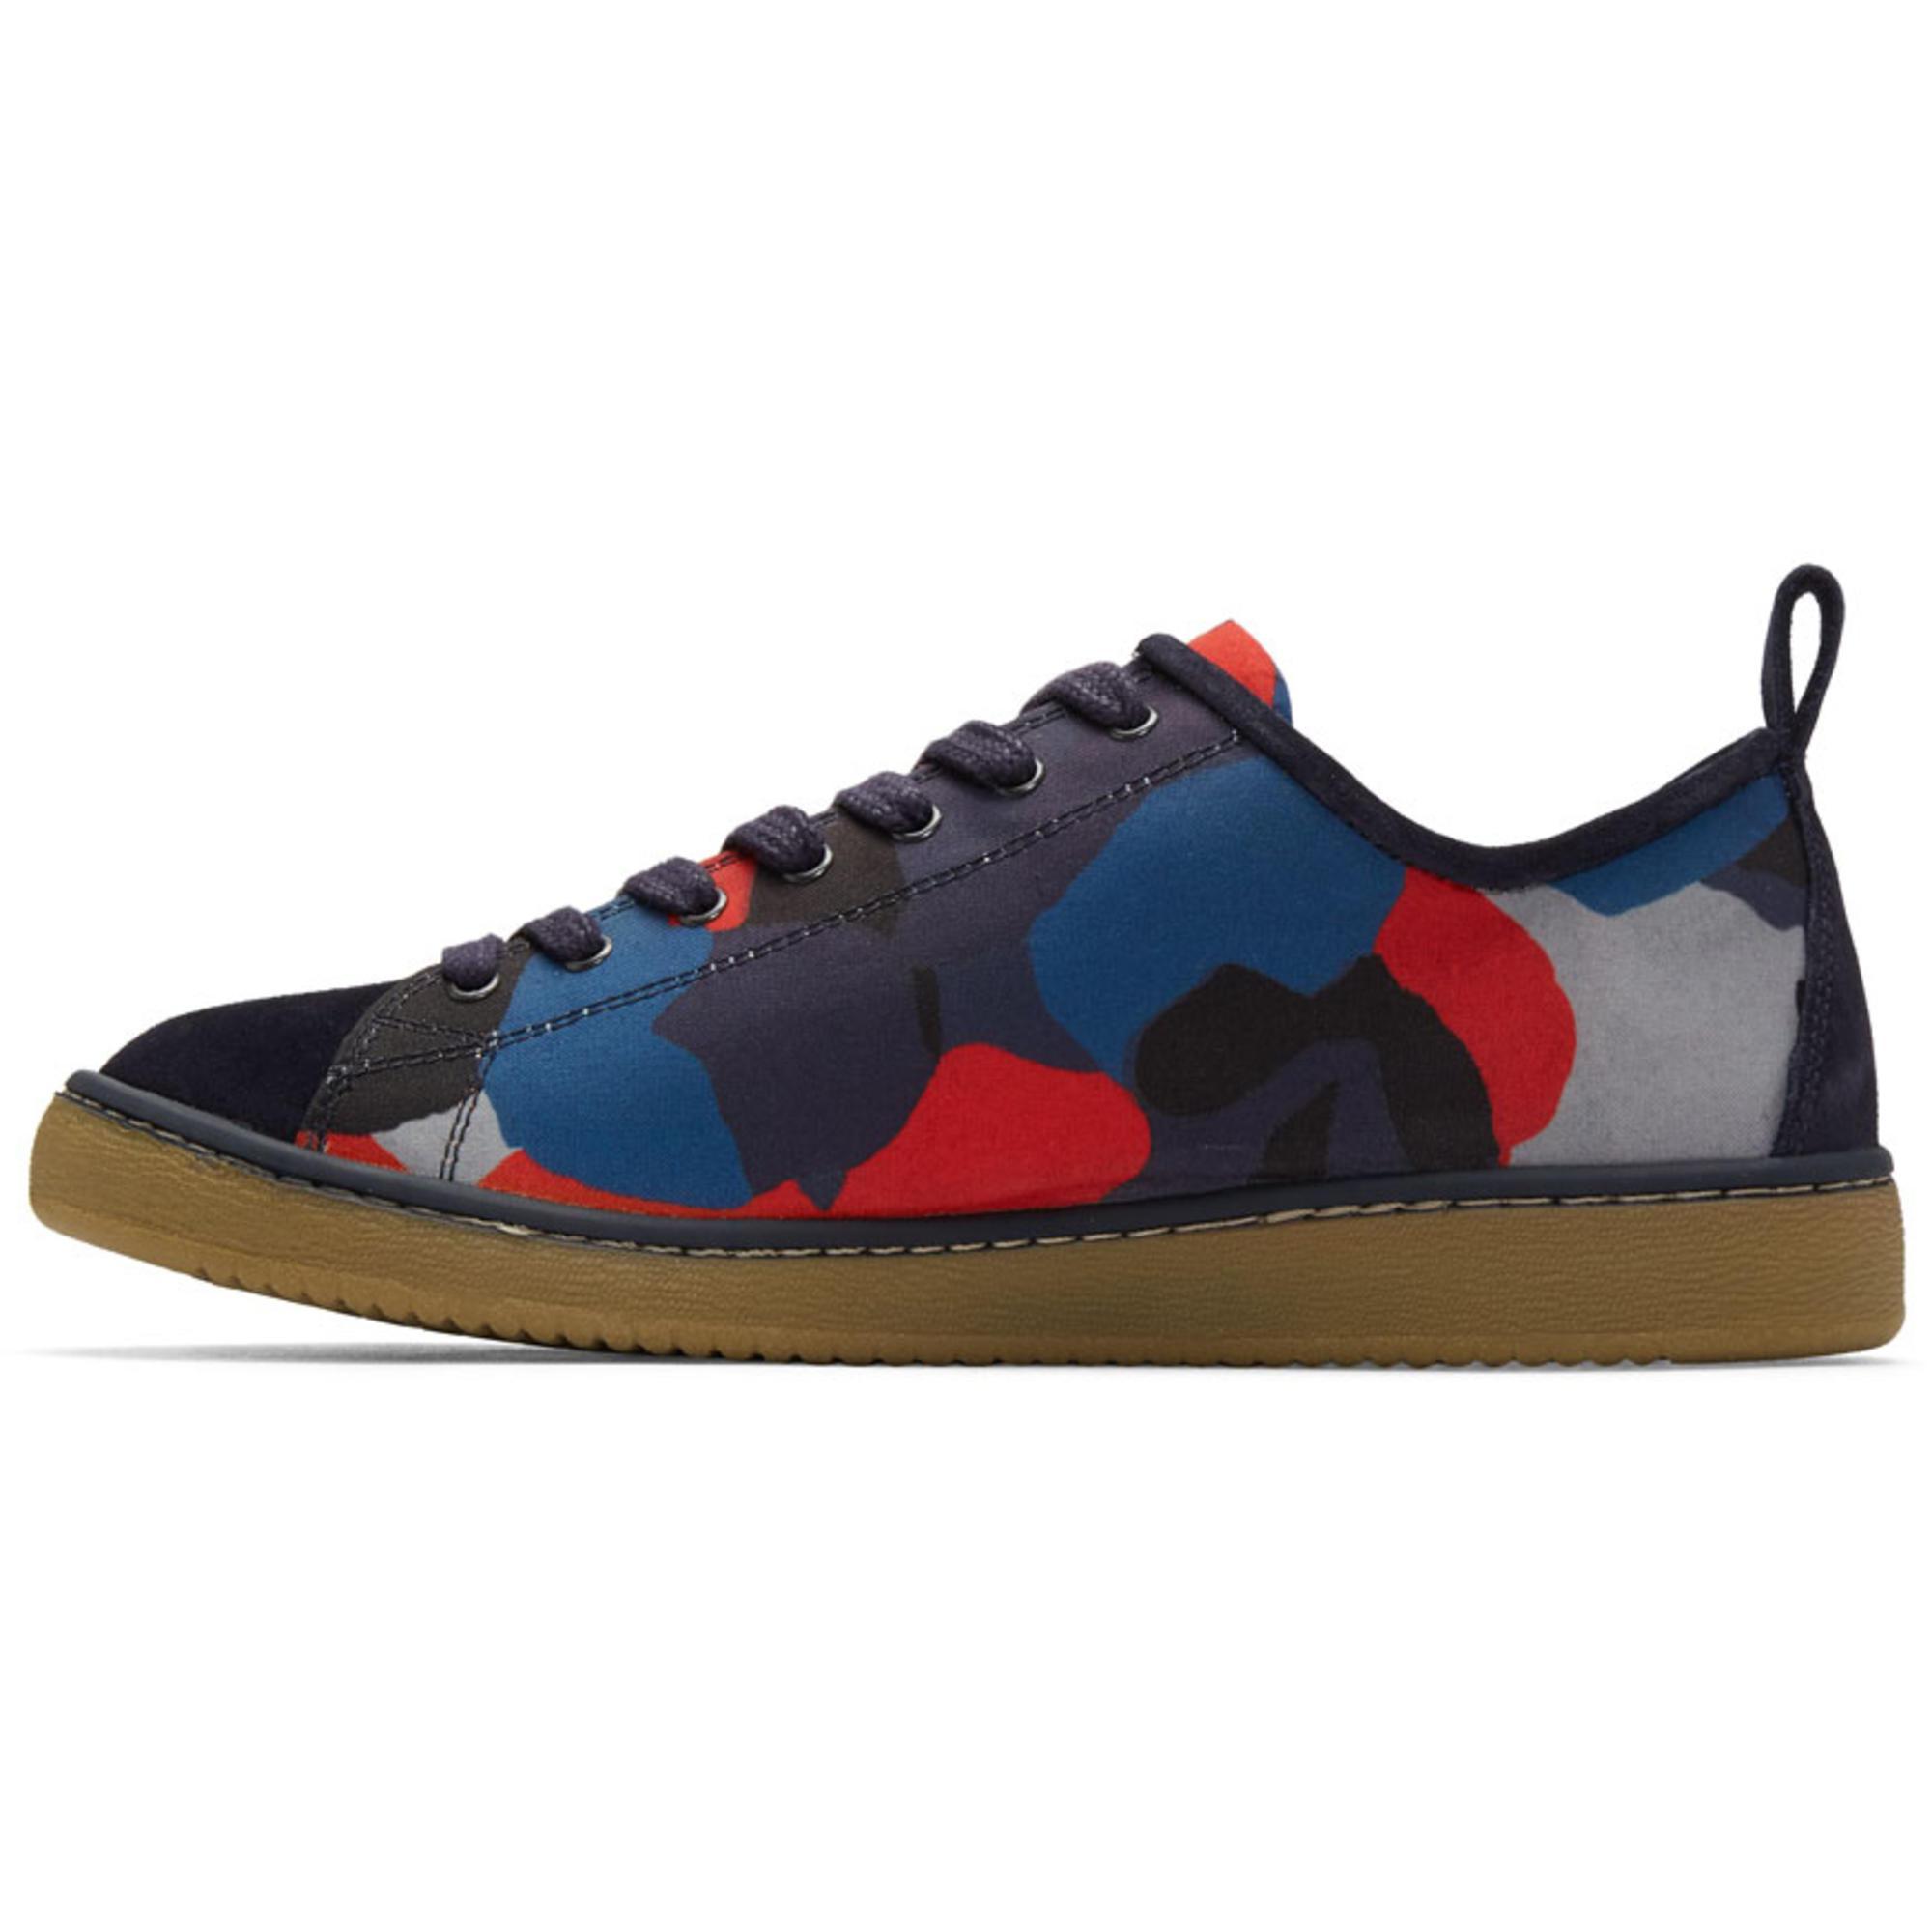 PS by Paul Smith Navy & Red Camo Miyata Sneakers 5Ae63e